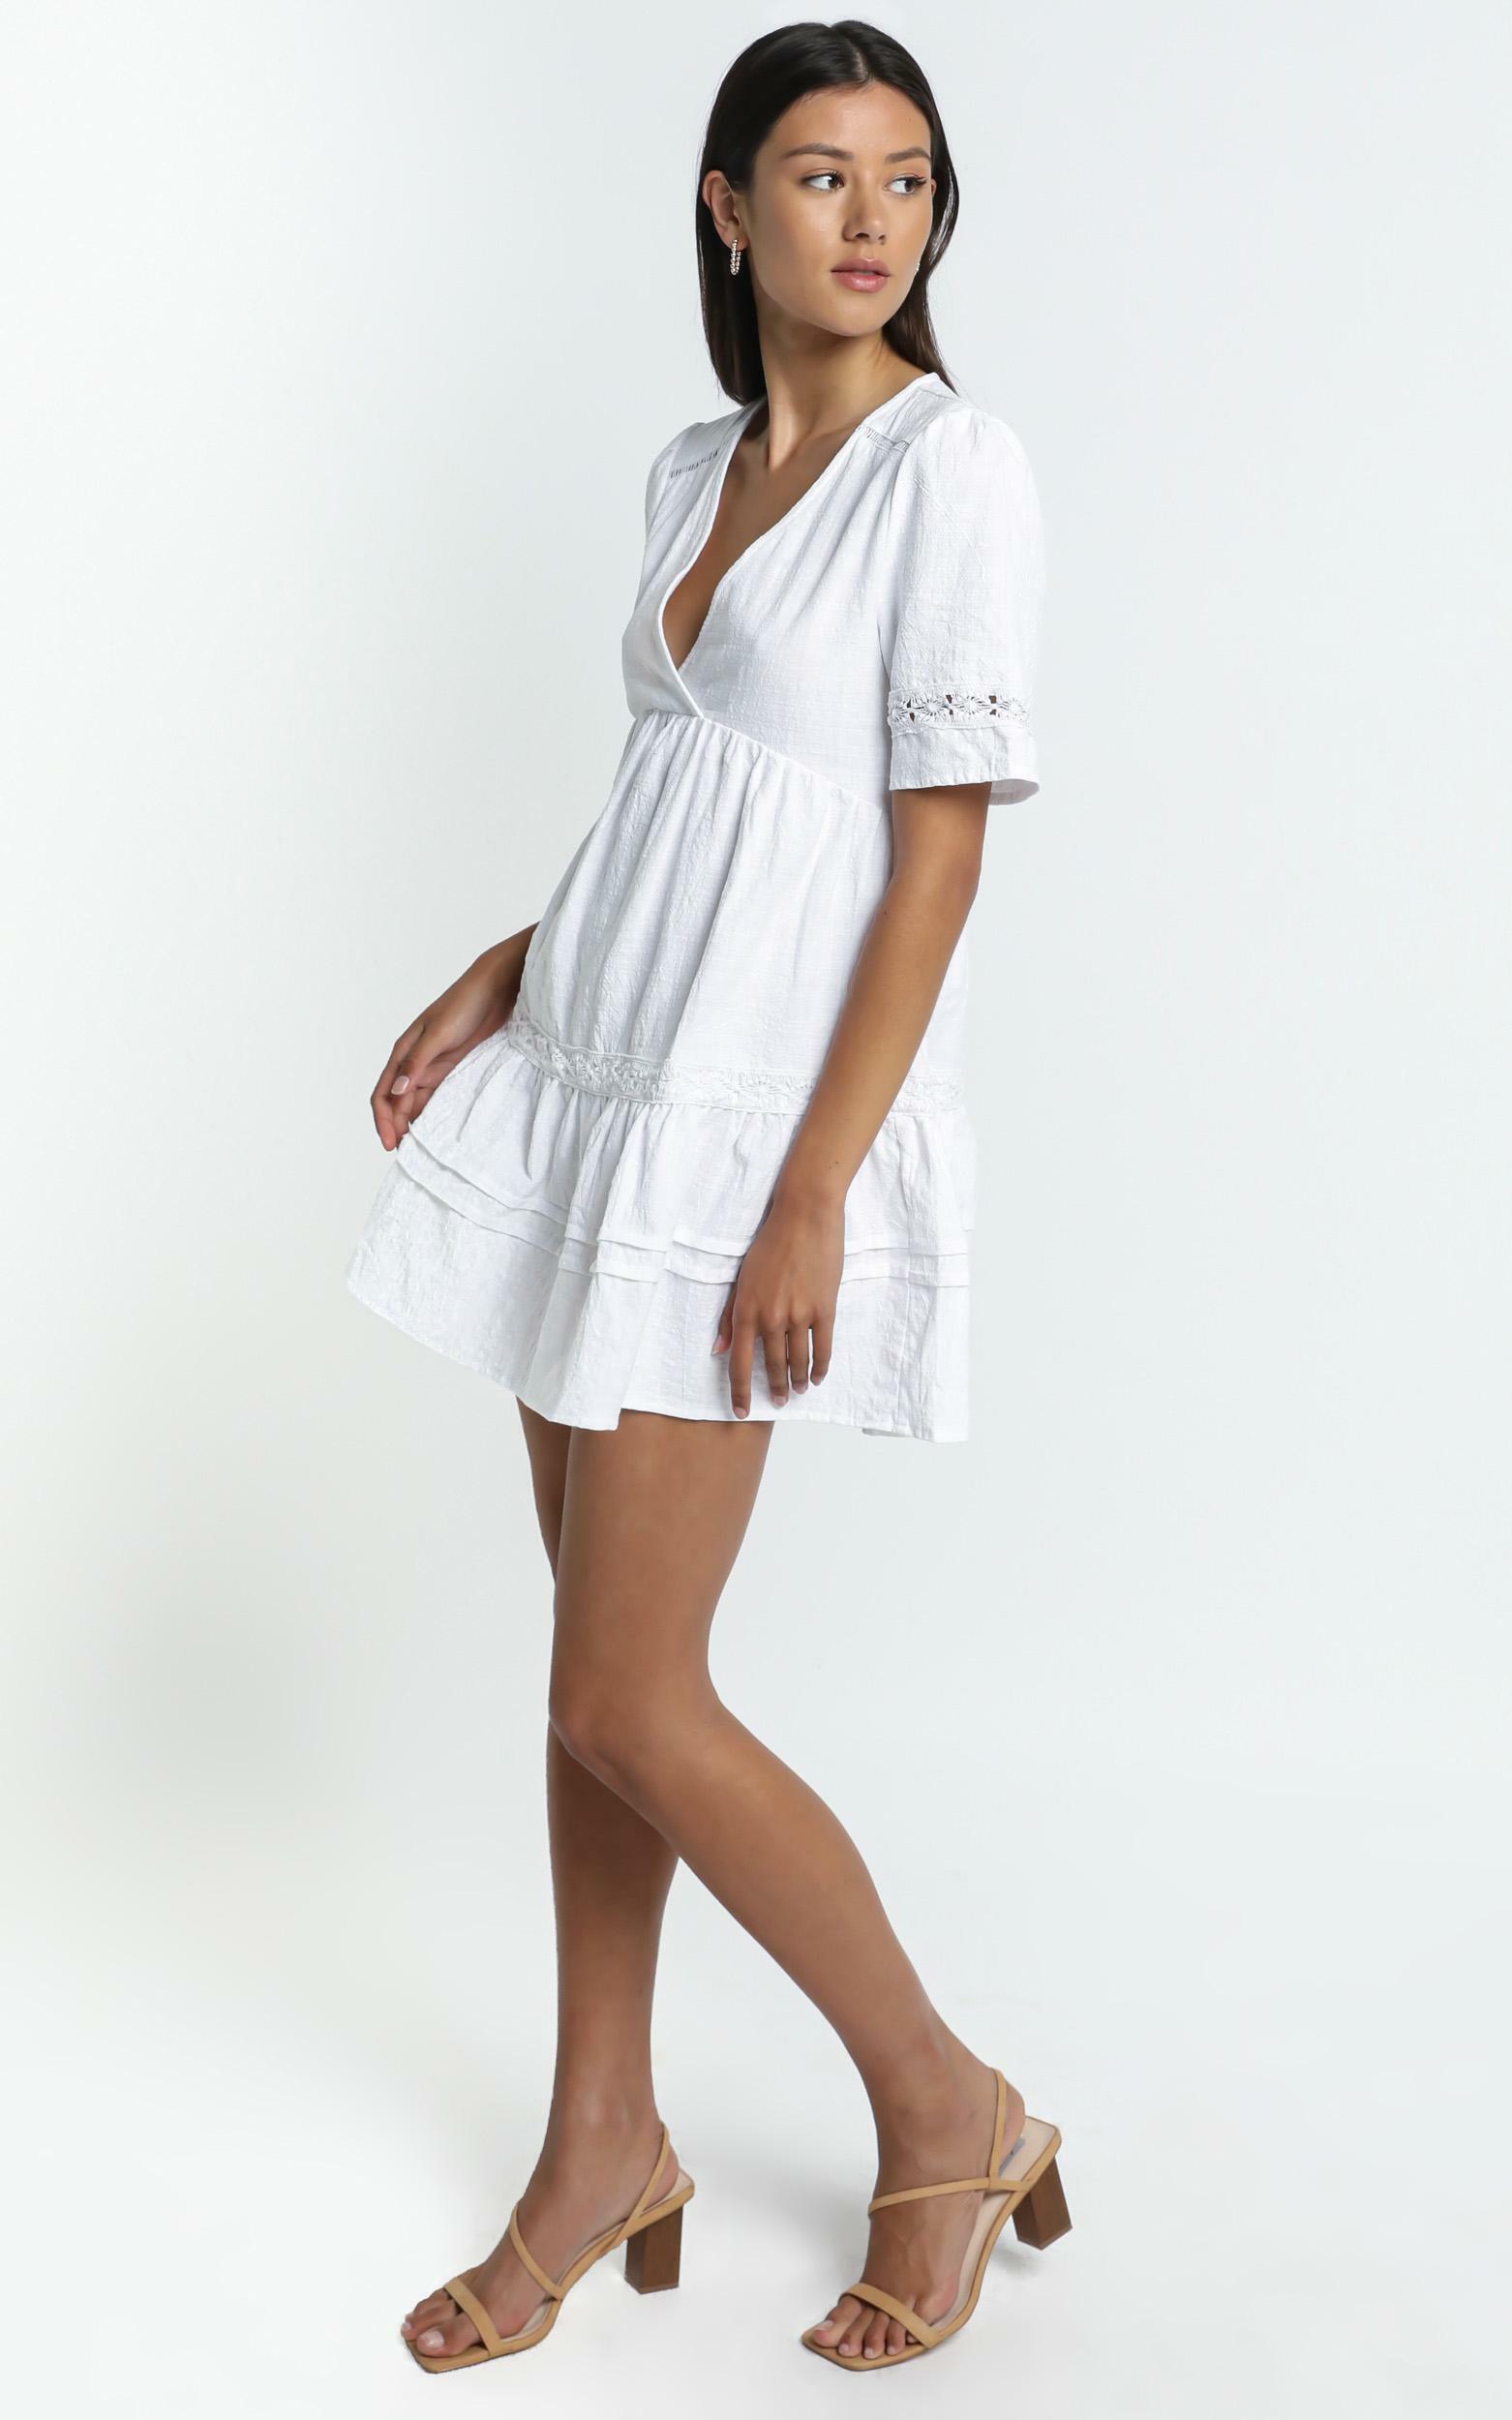 Hampton Dress in White - 6 (XS), White, hi-res image number null